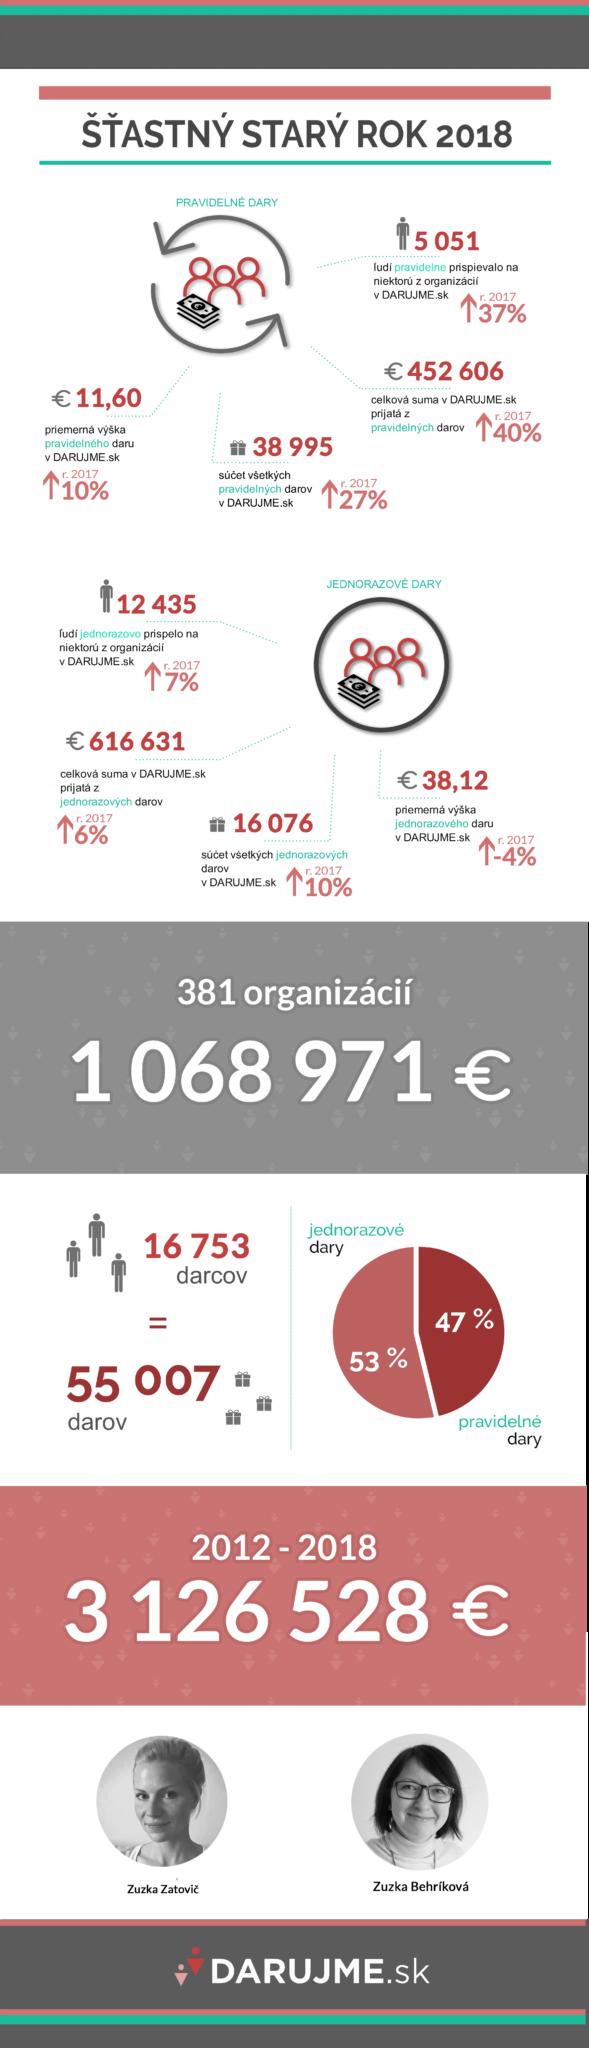 DARUJME.sk v roku 2018